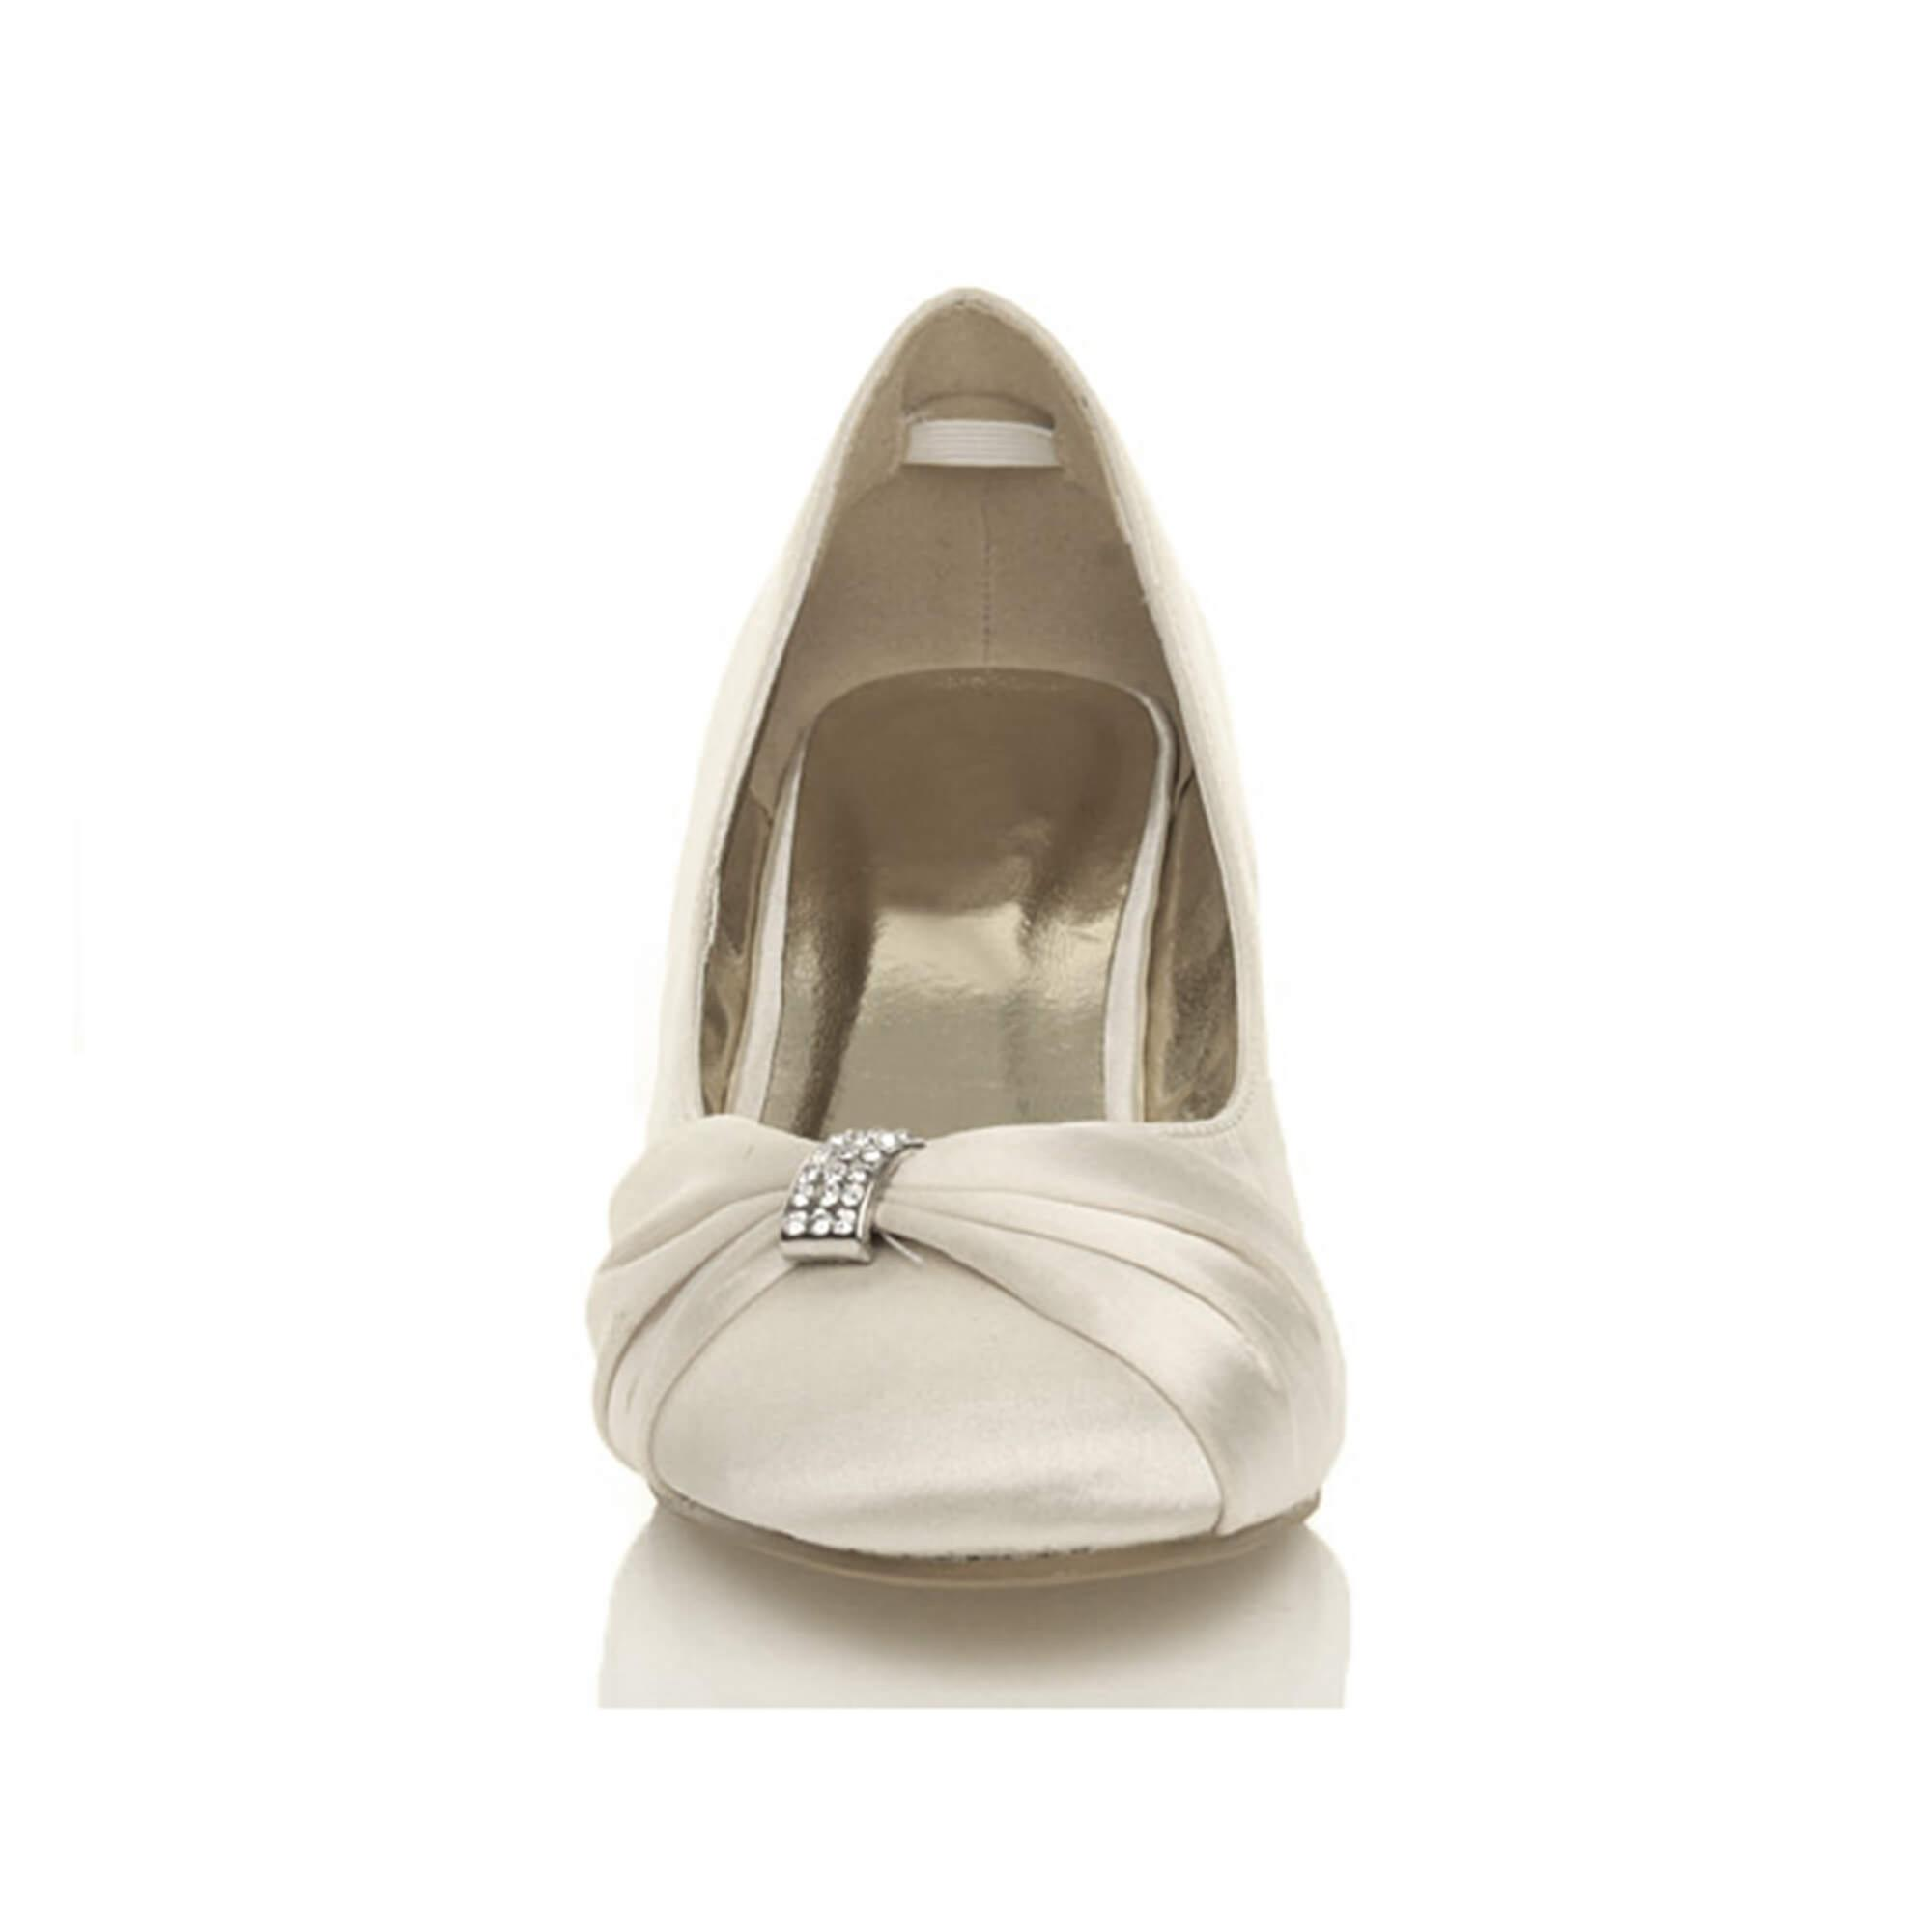 Ajvani womens low mid heel ruched diamante evening prom prom prom wedding bridal shoes 64ba12